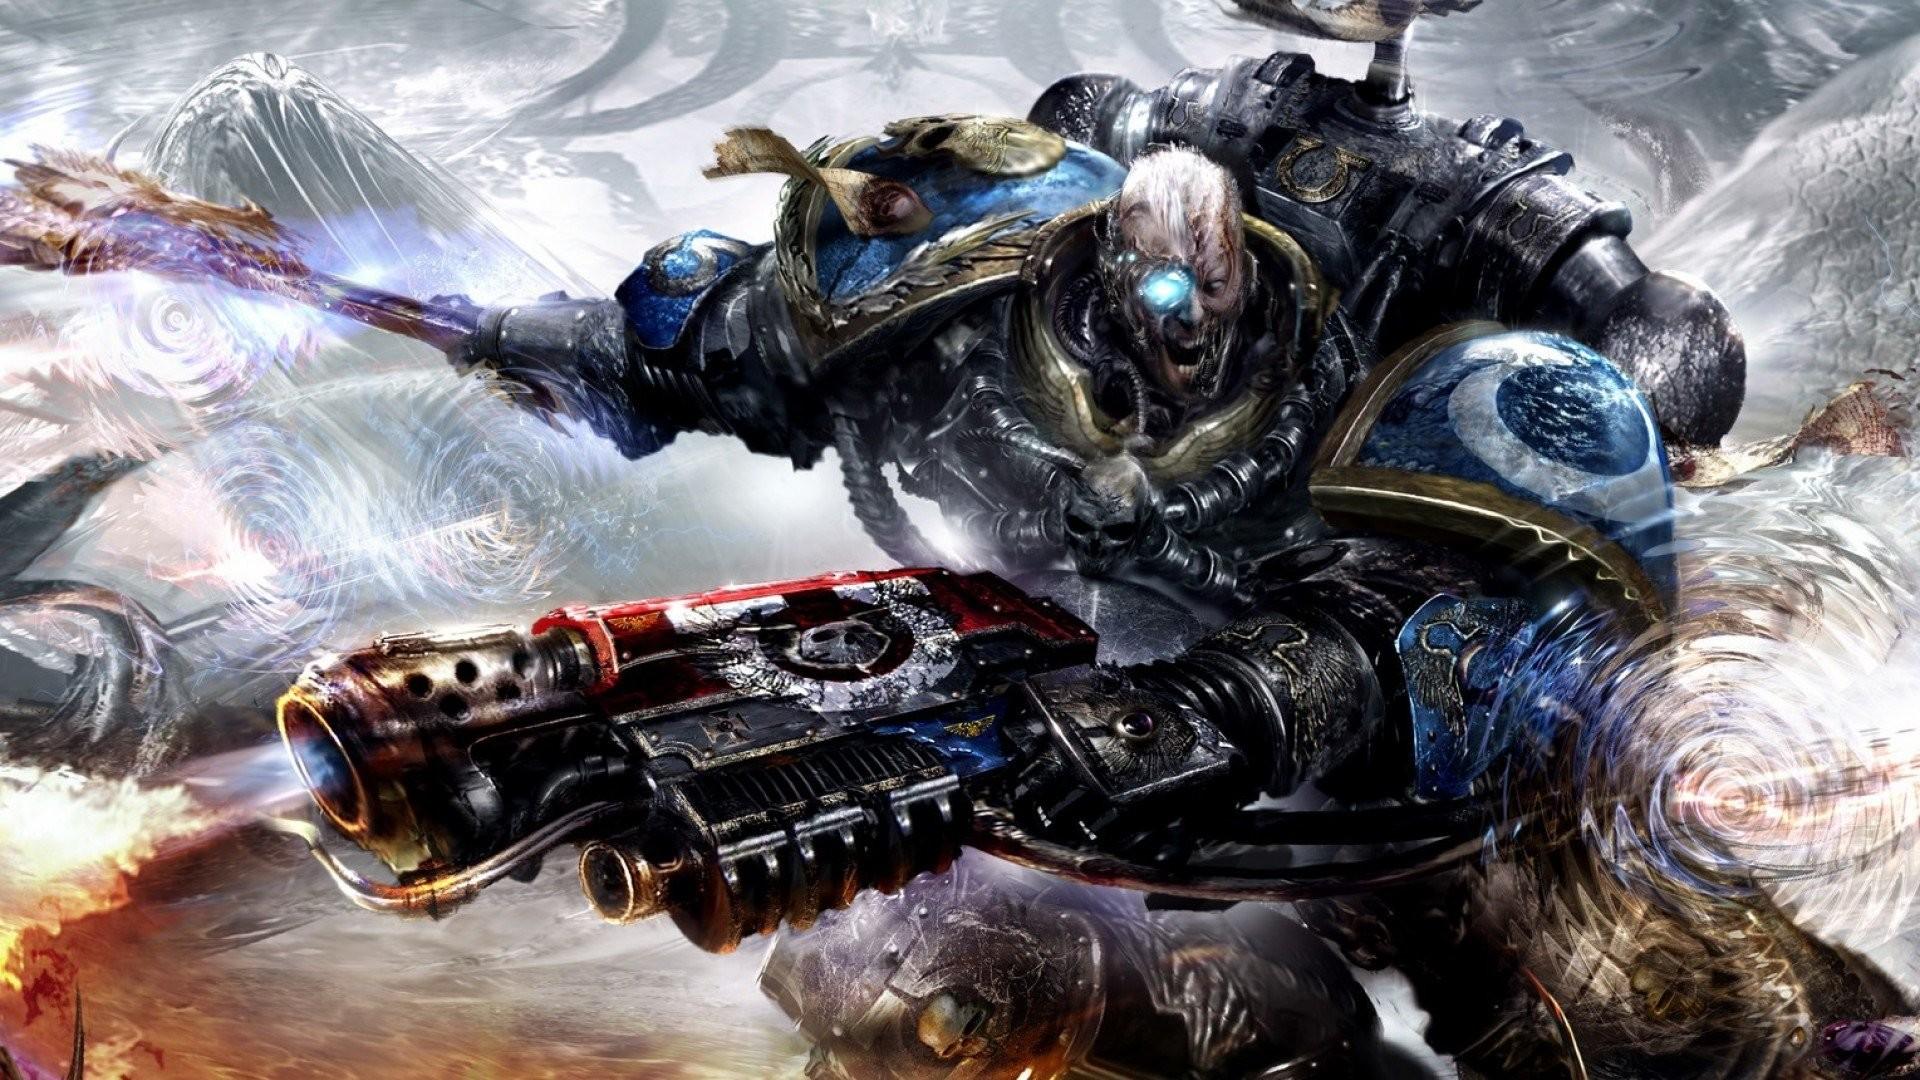 space-warhammer-wallpaper-tyranids-marines-chaos-marine-wallpapers.jpg  (1920×1080) | Warhammer stuff | Pinterest | Warhammer 40K